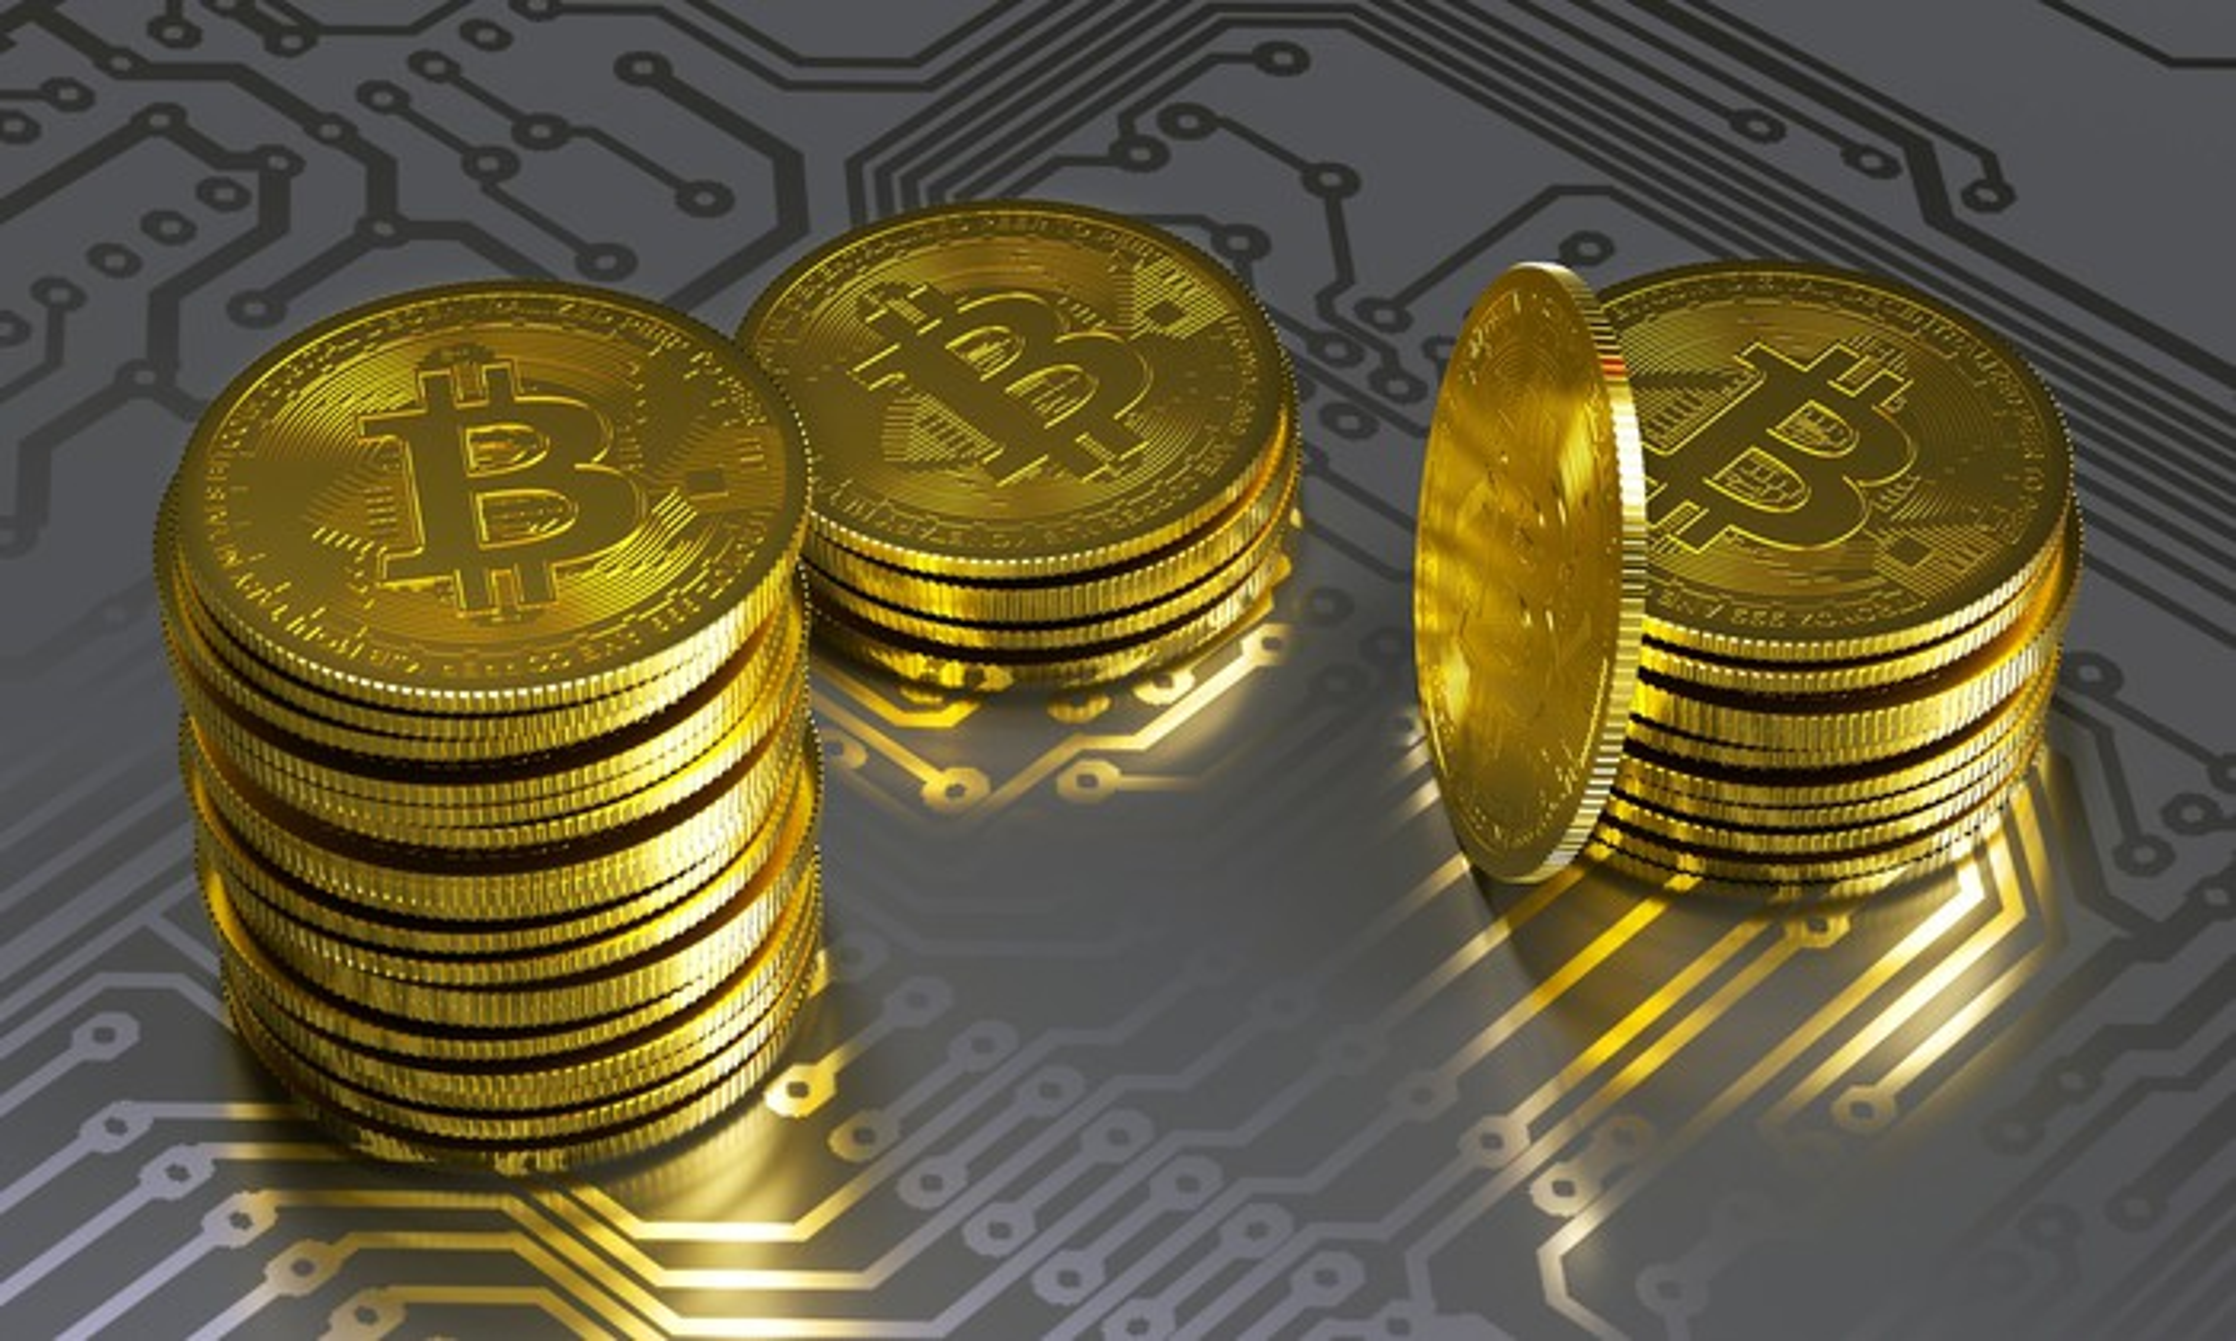 Stacks of gold coins bearing the bitcoin symbol